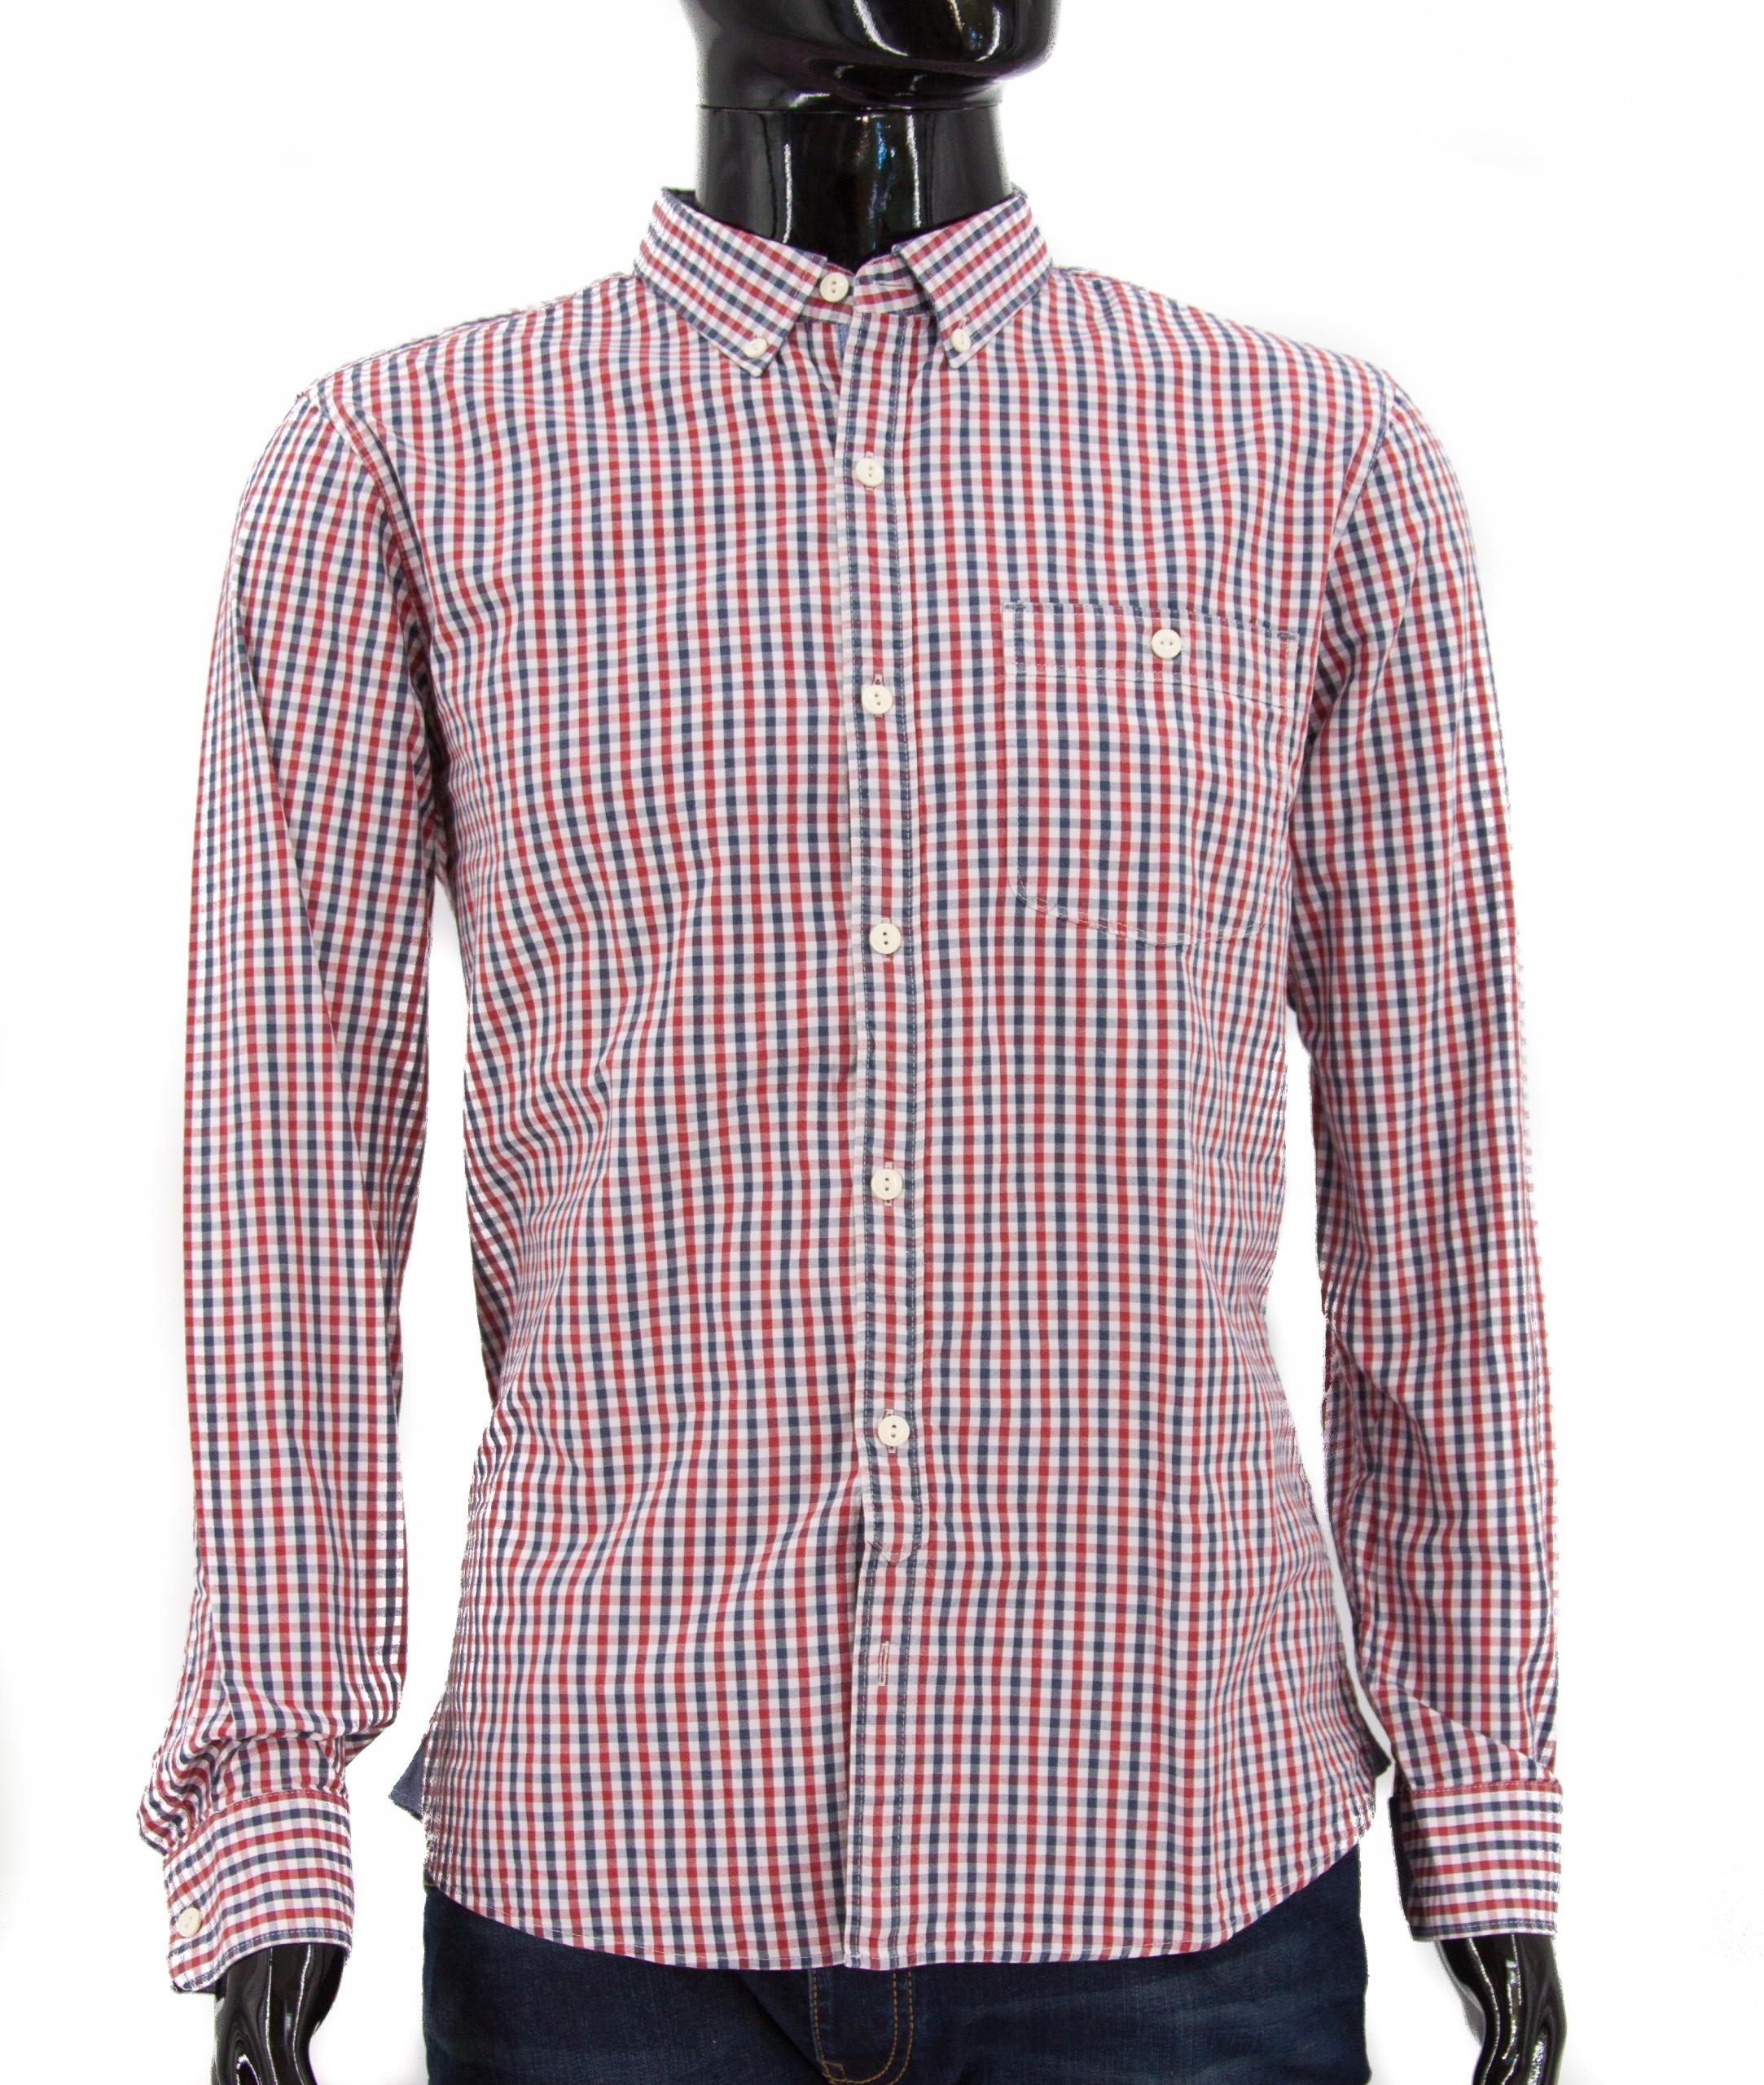 Koszula męska NEXT kratka, rozmiar L 7790568520 Allegro.pl  vGIEV